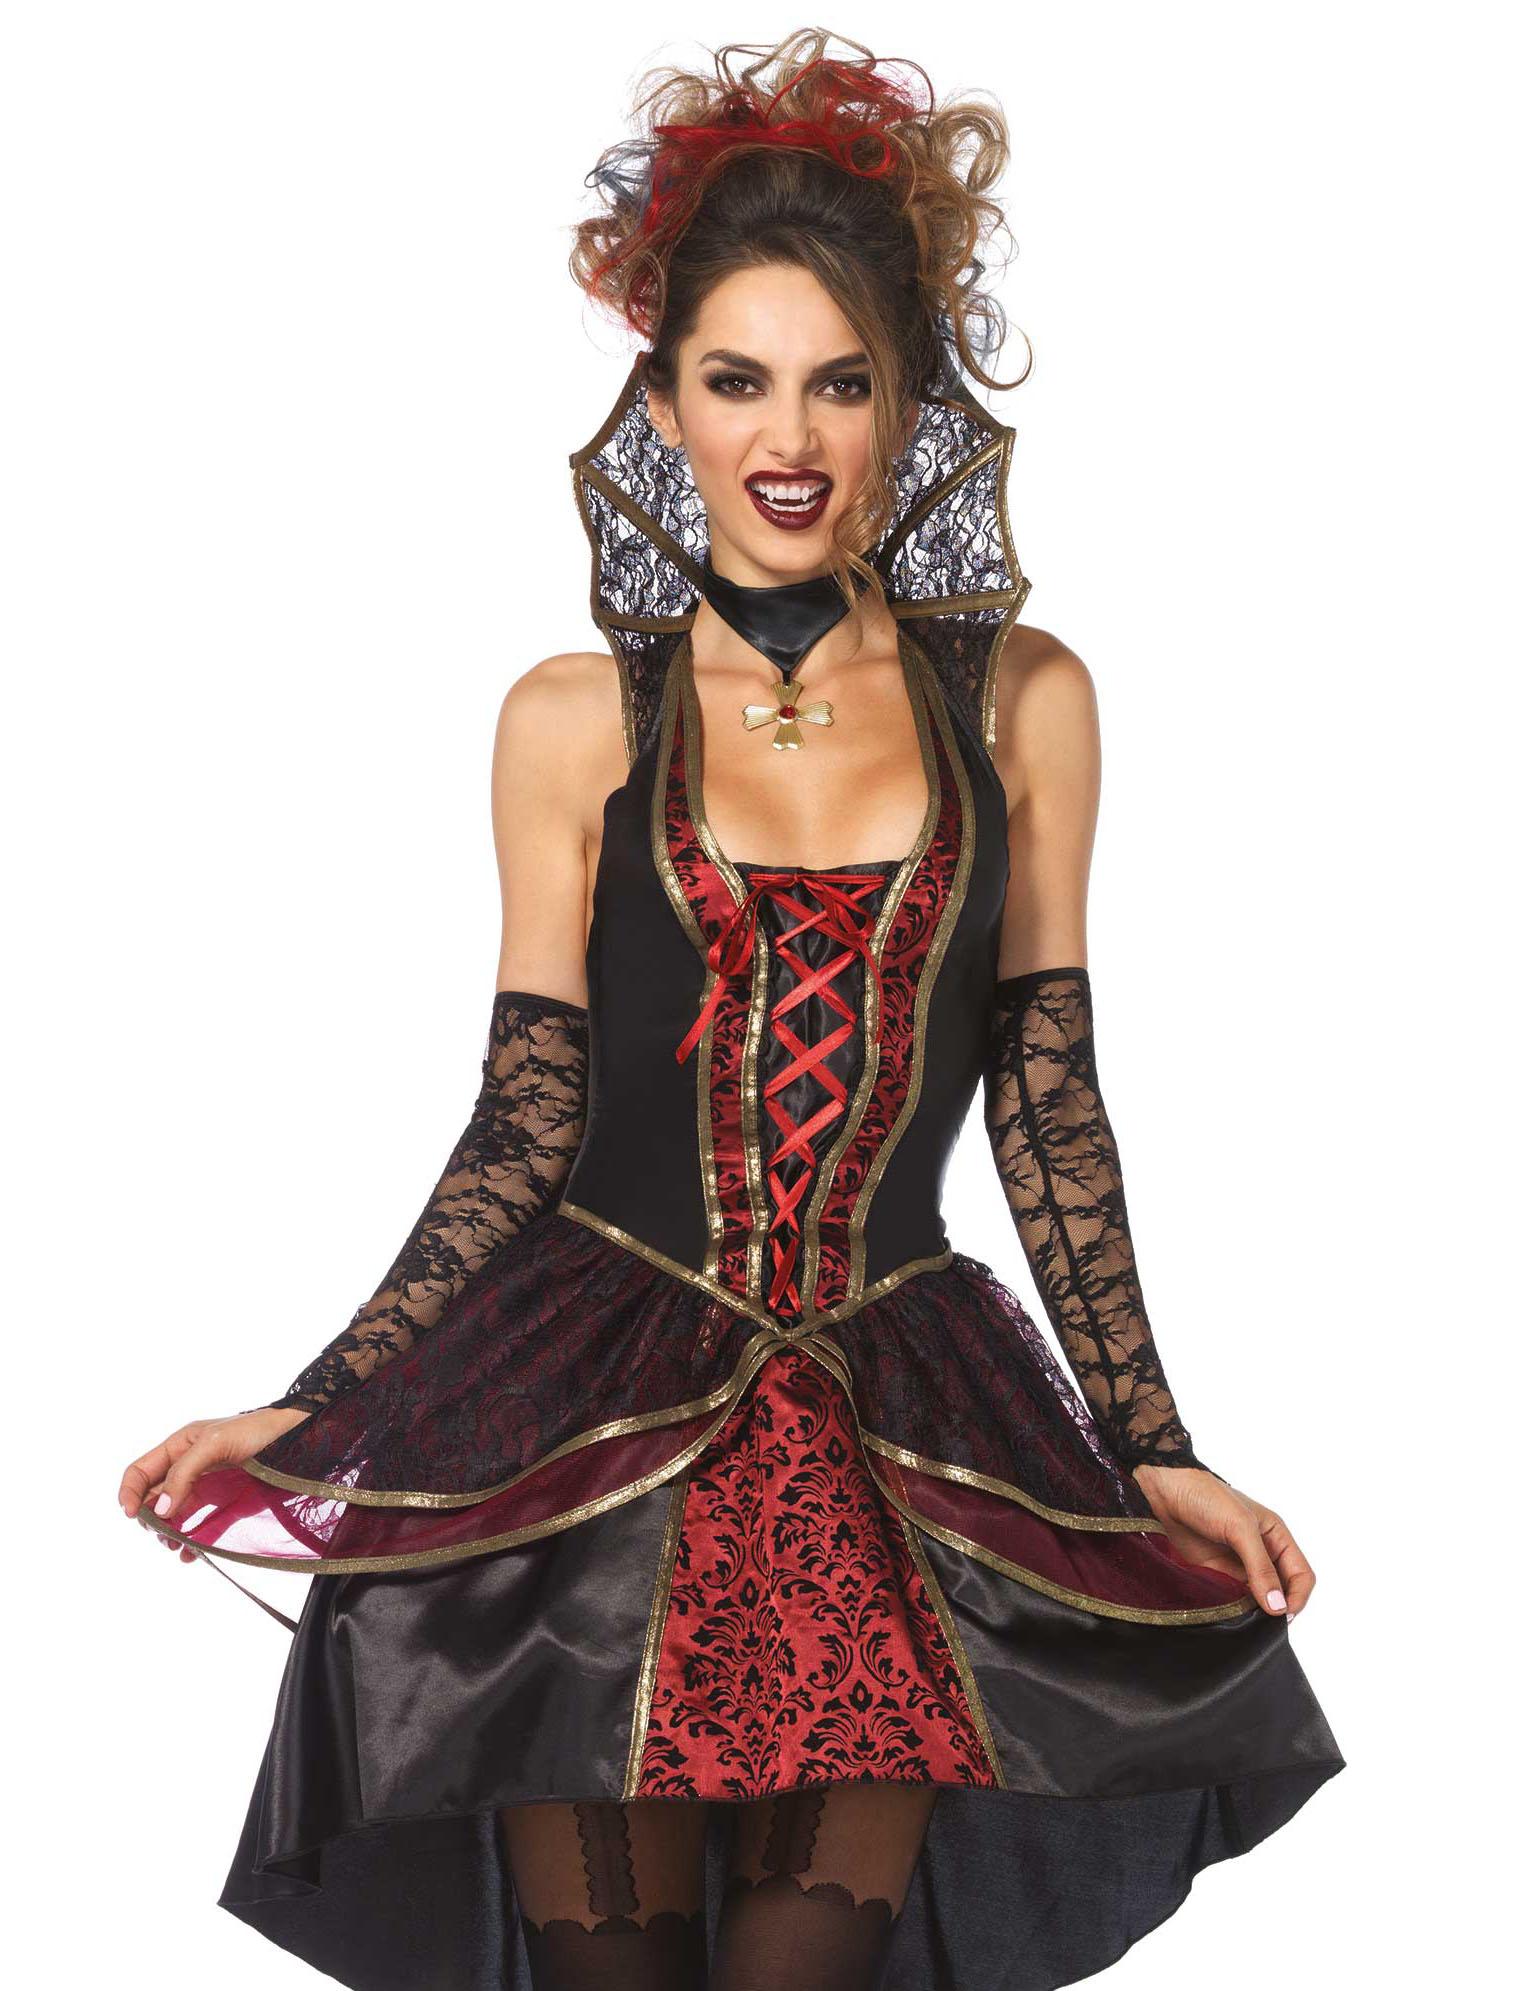 vampir kost m f r frauen kost me f r erwachsene und g nstige faschingskost me vegaoo. Black Bedroom Furniture Sets. Home Design Ideas